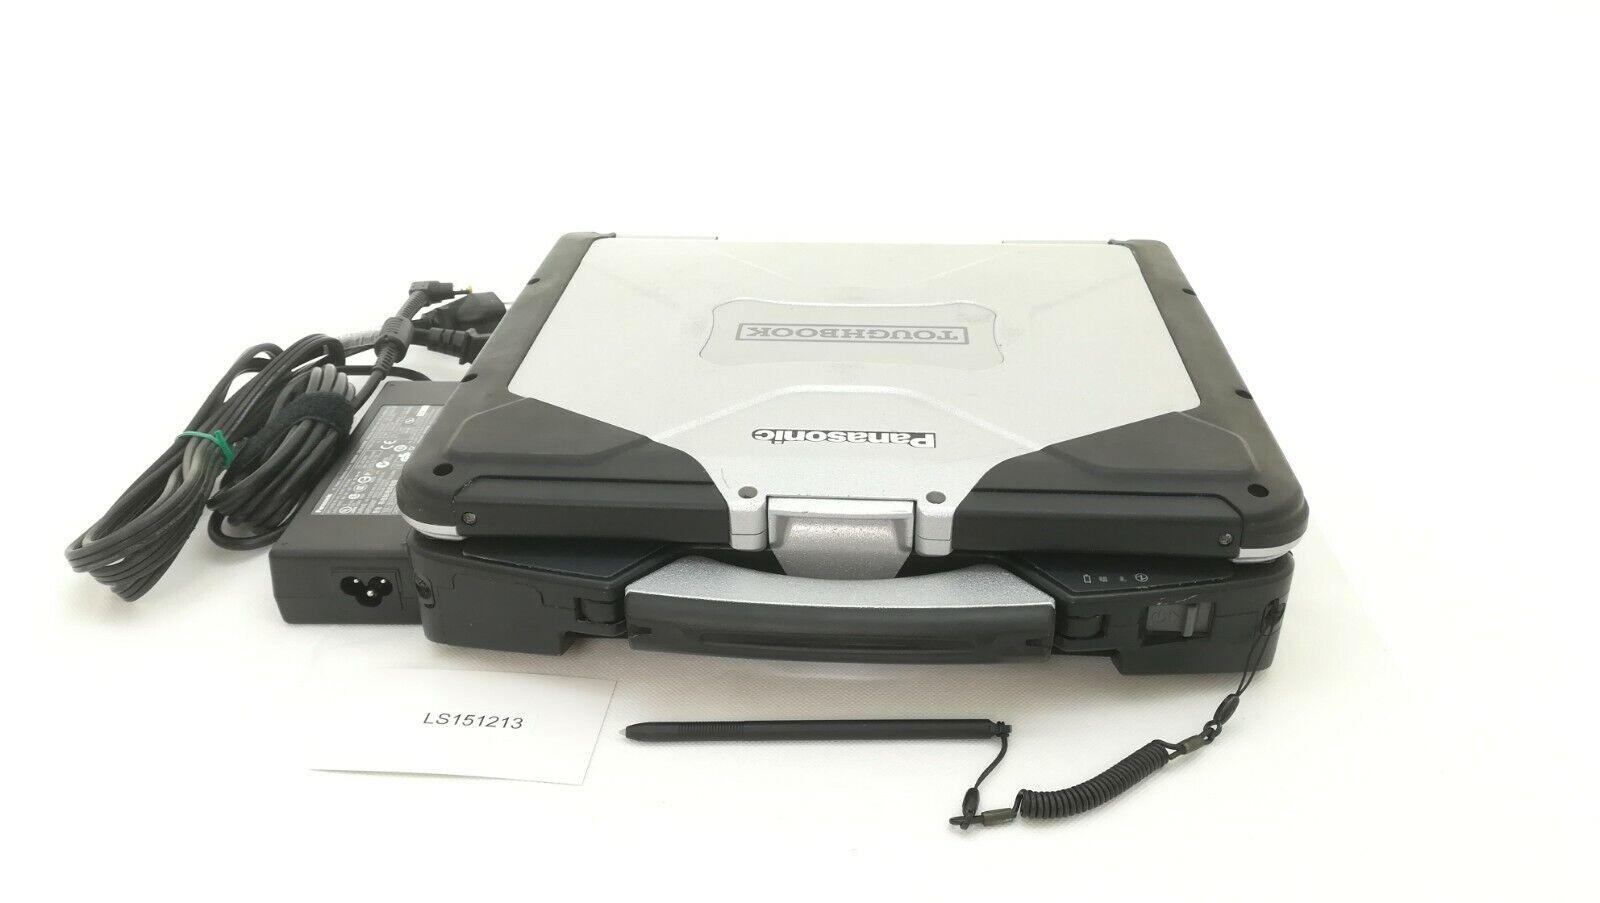 "Panasonic Toughbook CF31 MK3 I5-3380M 2.9GHz 8GB 500GB 13.1"" Touch screen Win 10"